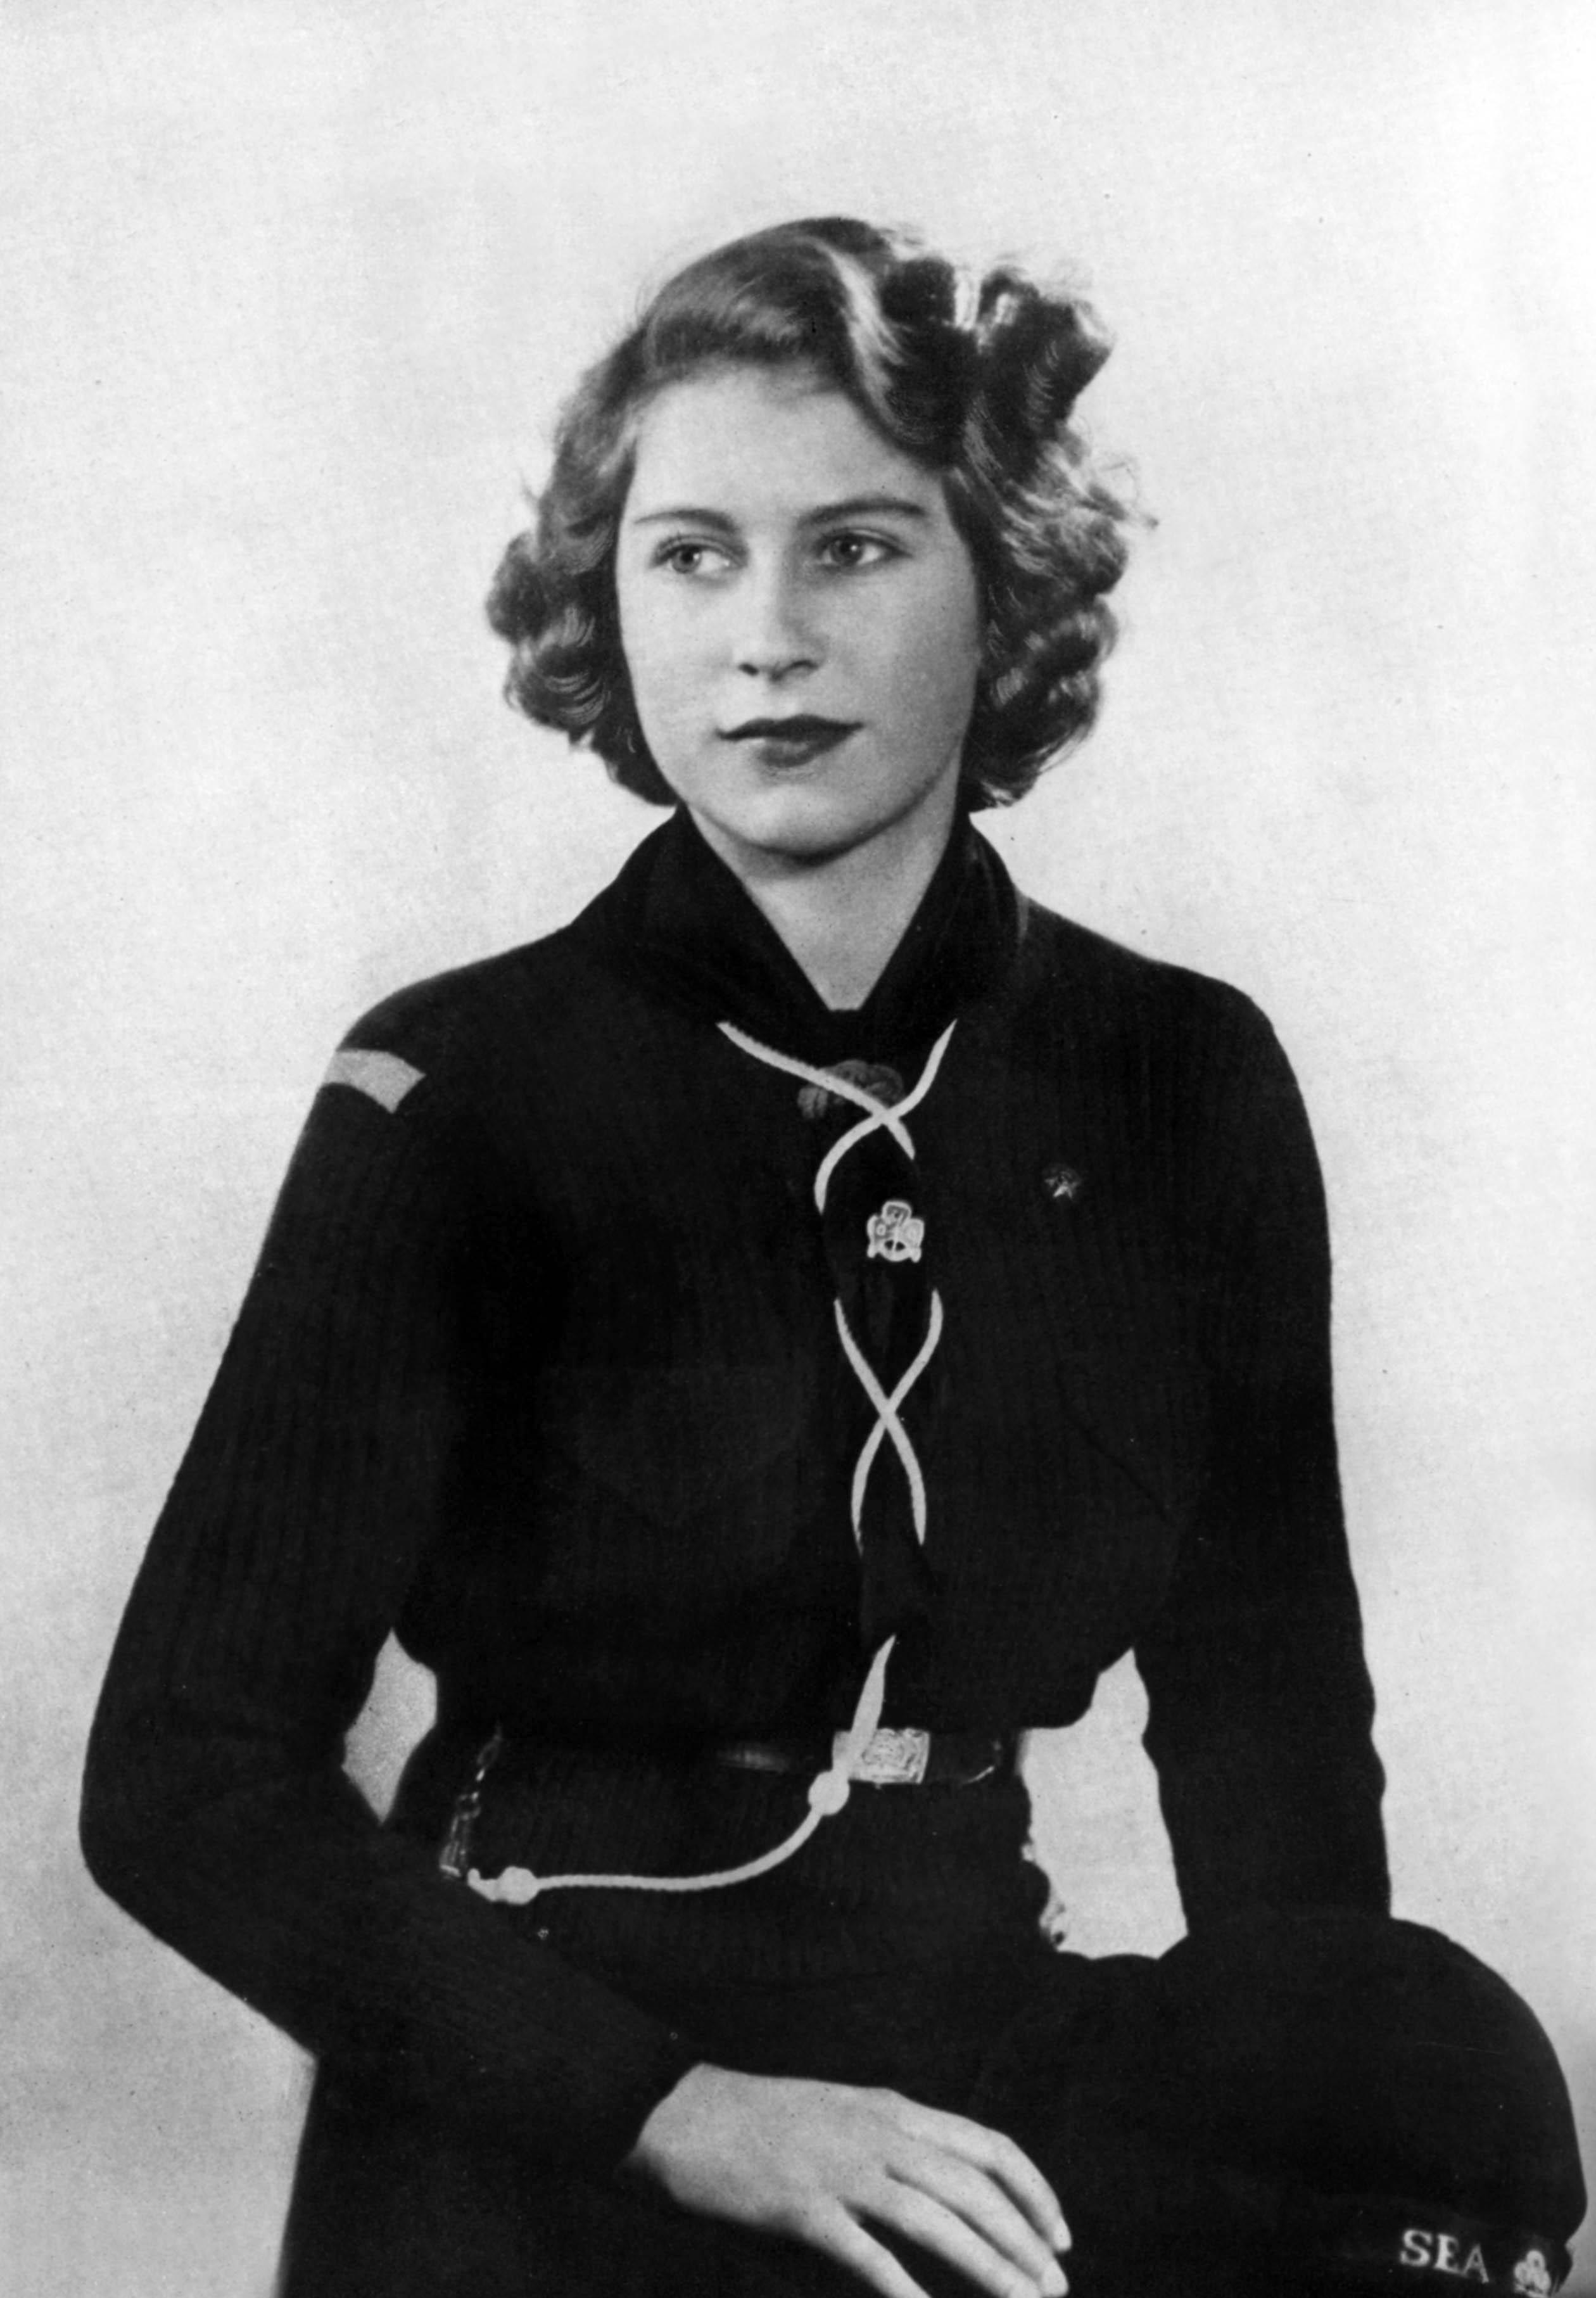 Princess Elizabeth Girl Guides Getty Images